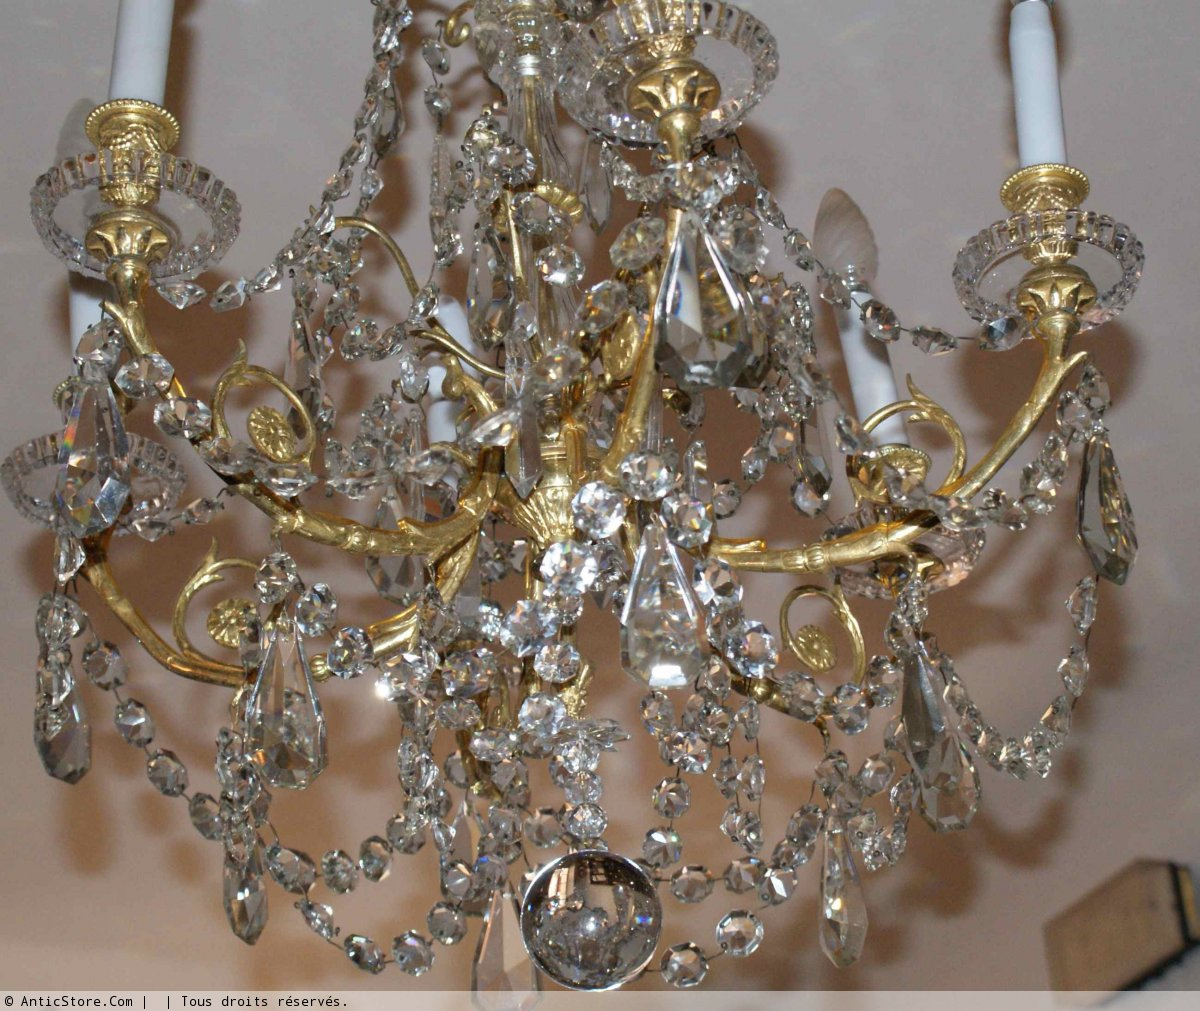 lustre napol on iii antiquit s sur anticstore. Black Bedroom Furniture Sets. Home Design Ideas